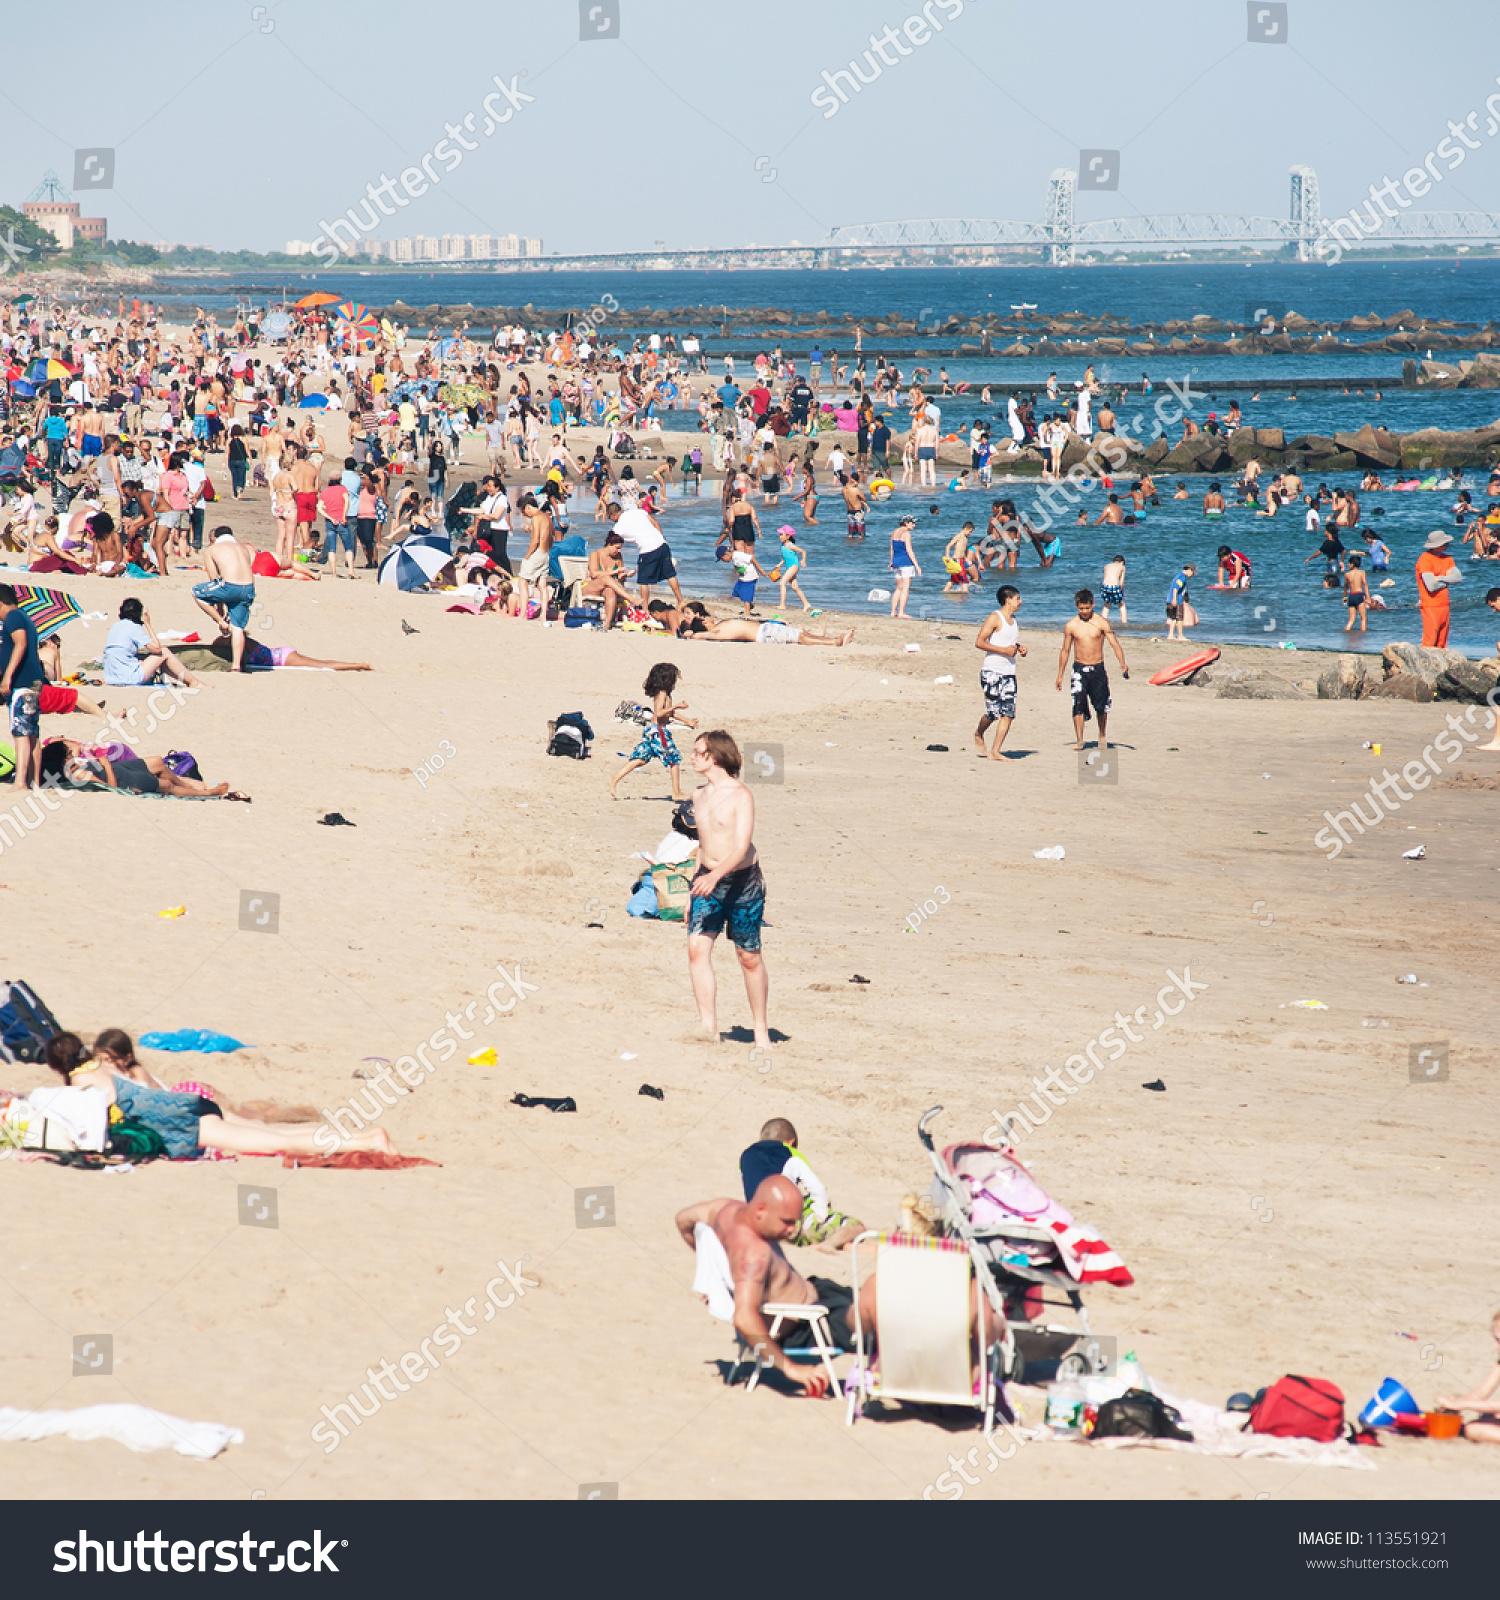 Island Beach People: June 27: People On The Beach On June 27, 2012